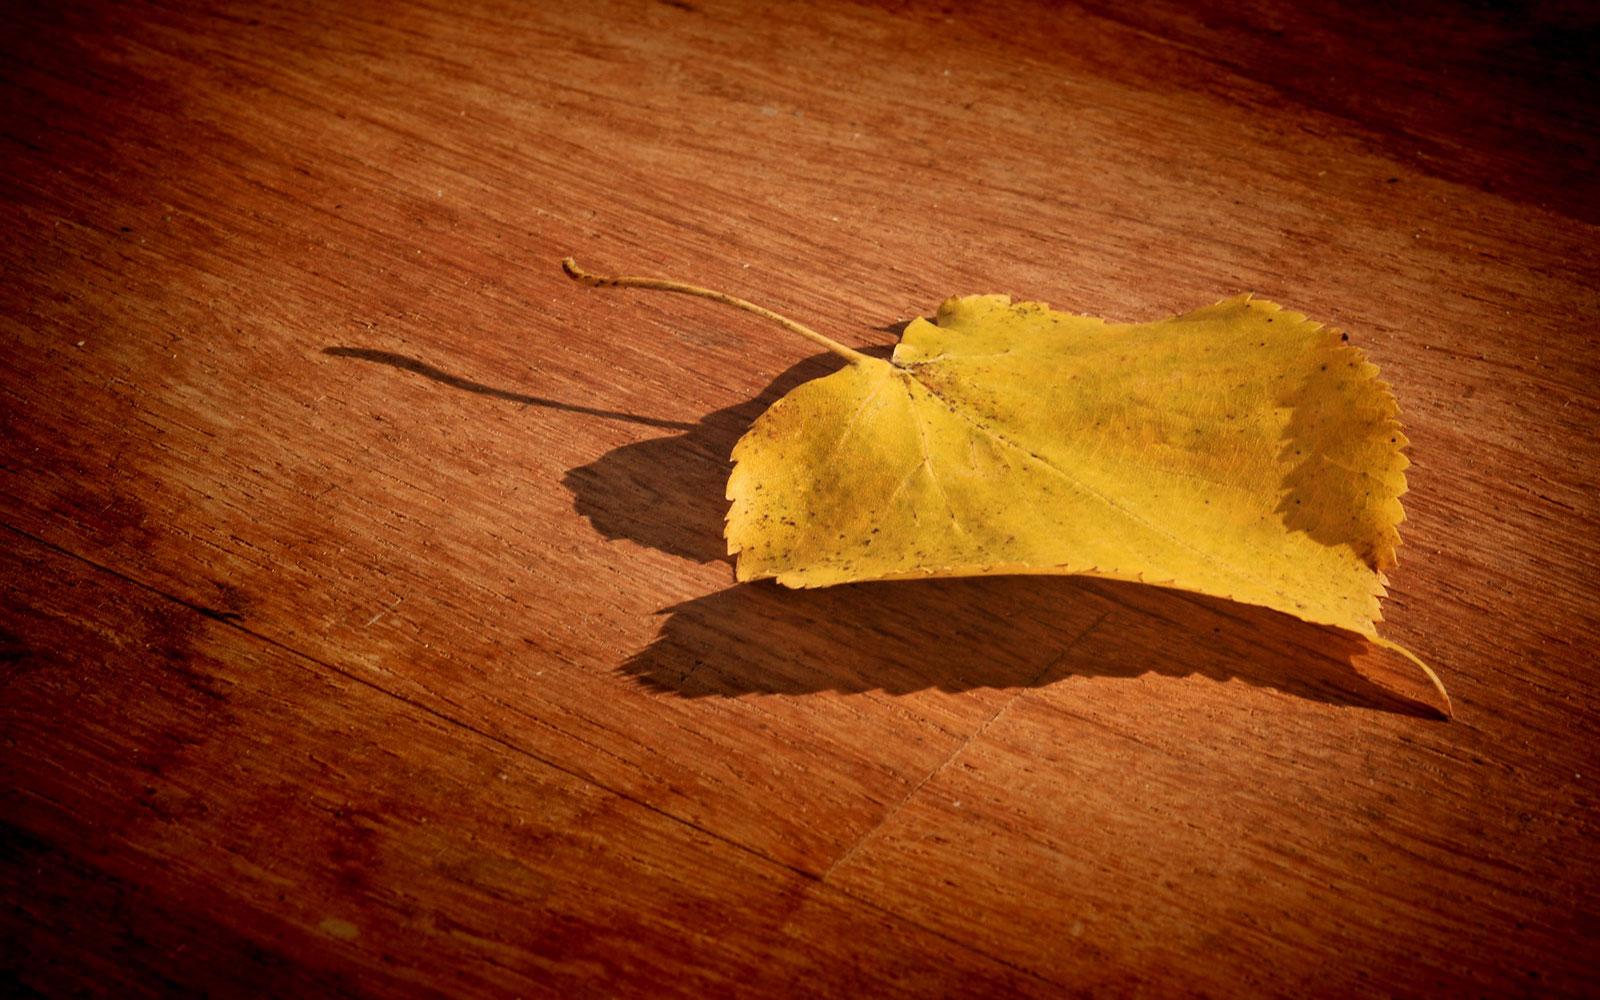 Fall Leaves Desktop Wallpaper Backgrouns Leaf Wallpaper Hd Desktop Wallpapers 4k Hd